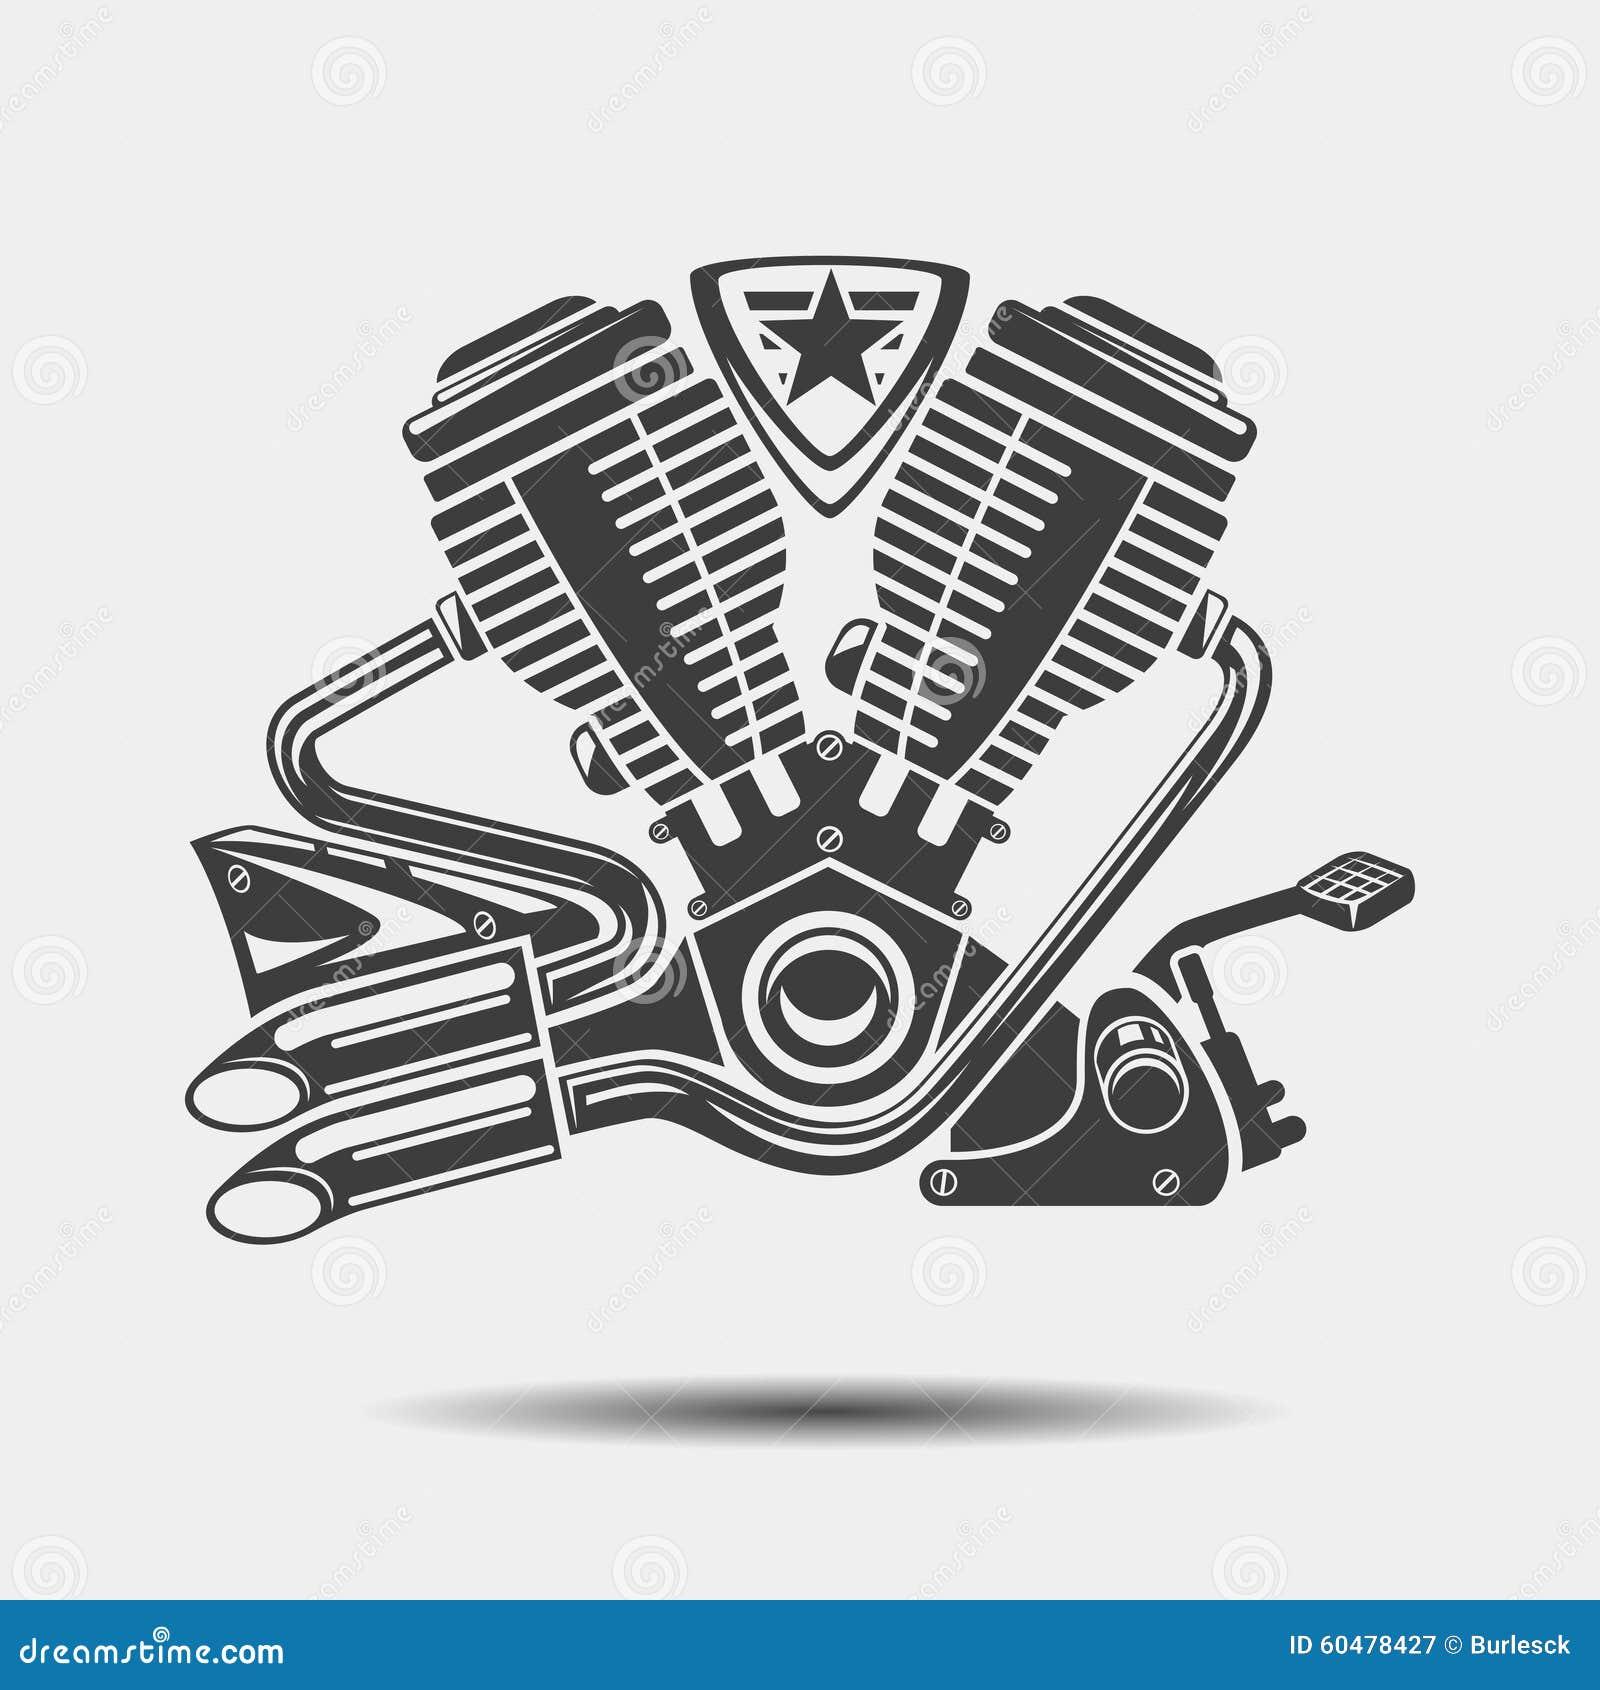 Tour de motor de fondo de hierro